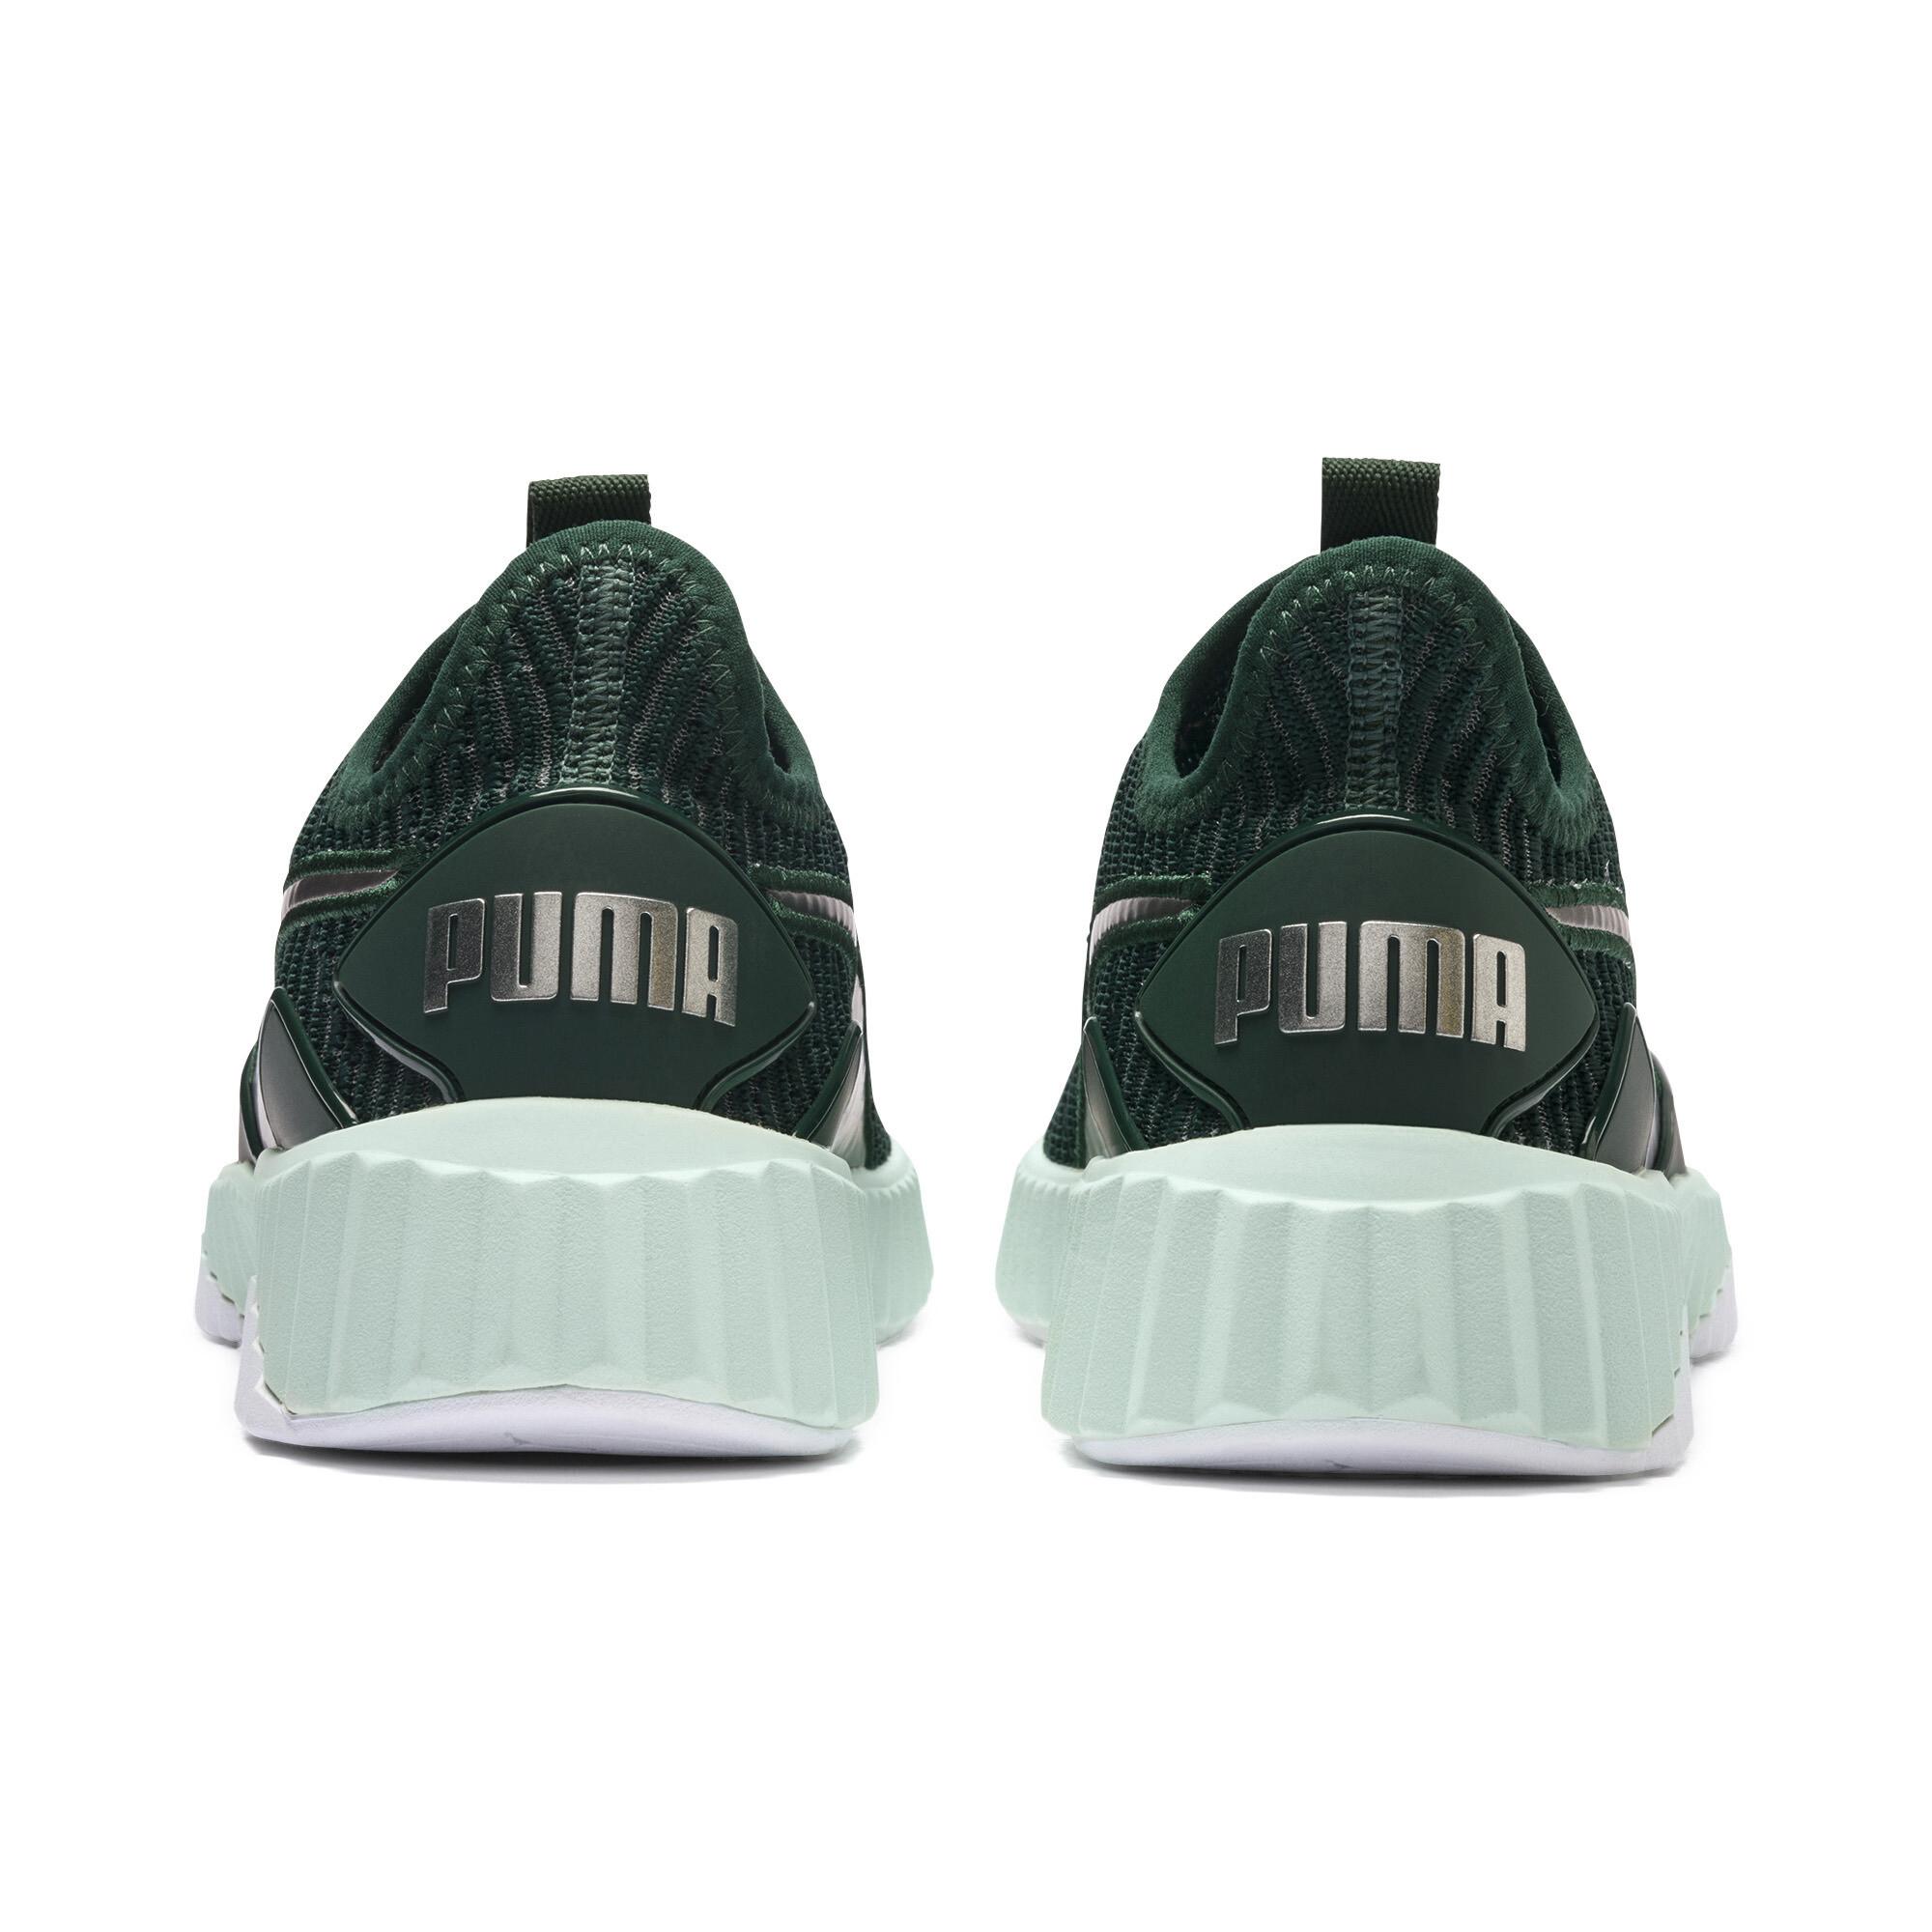 Image Puma Defy Trailblazer Women's Sneakers #4